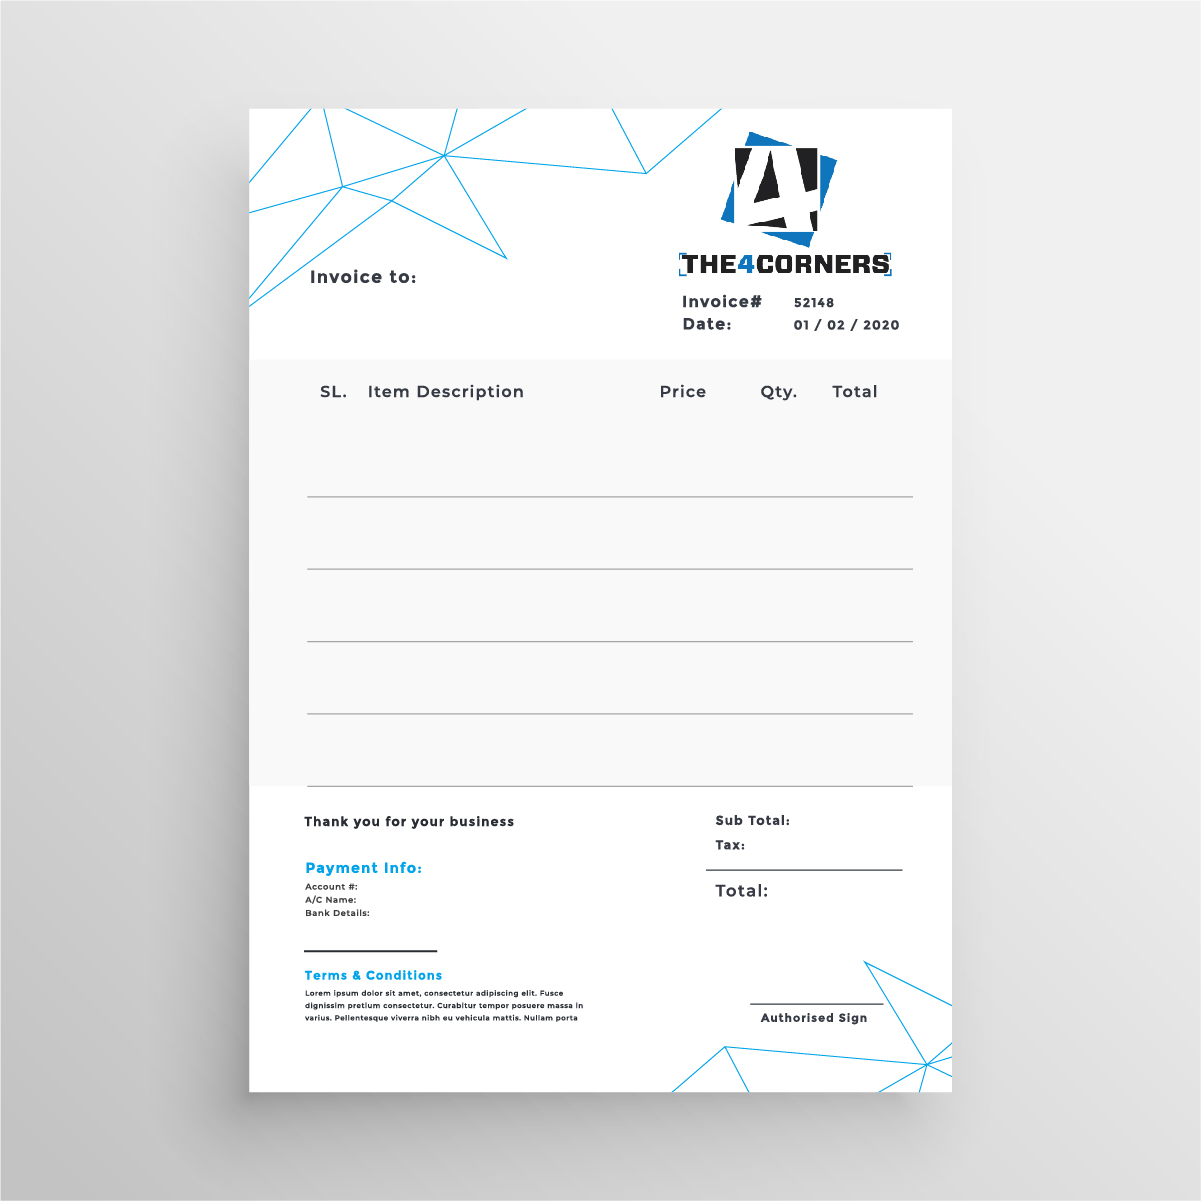 Invoice design for ecommerce company by Badri Design